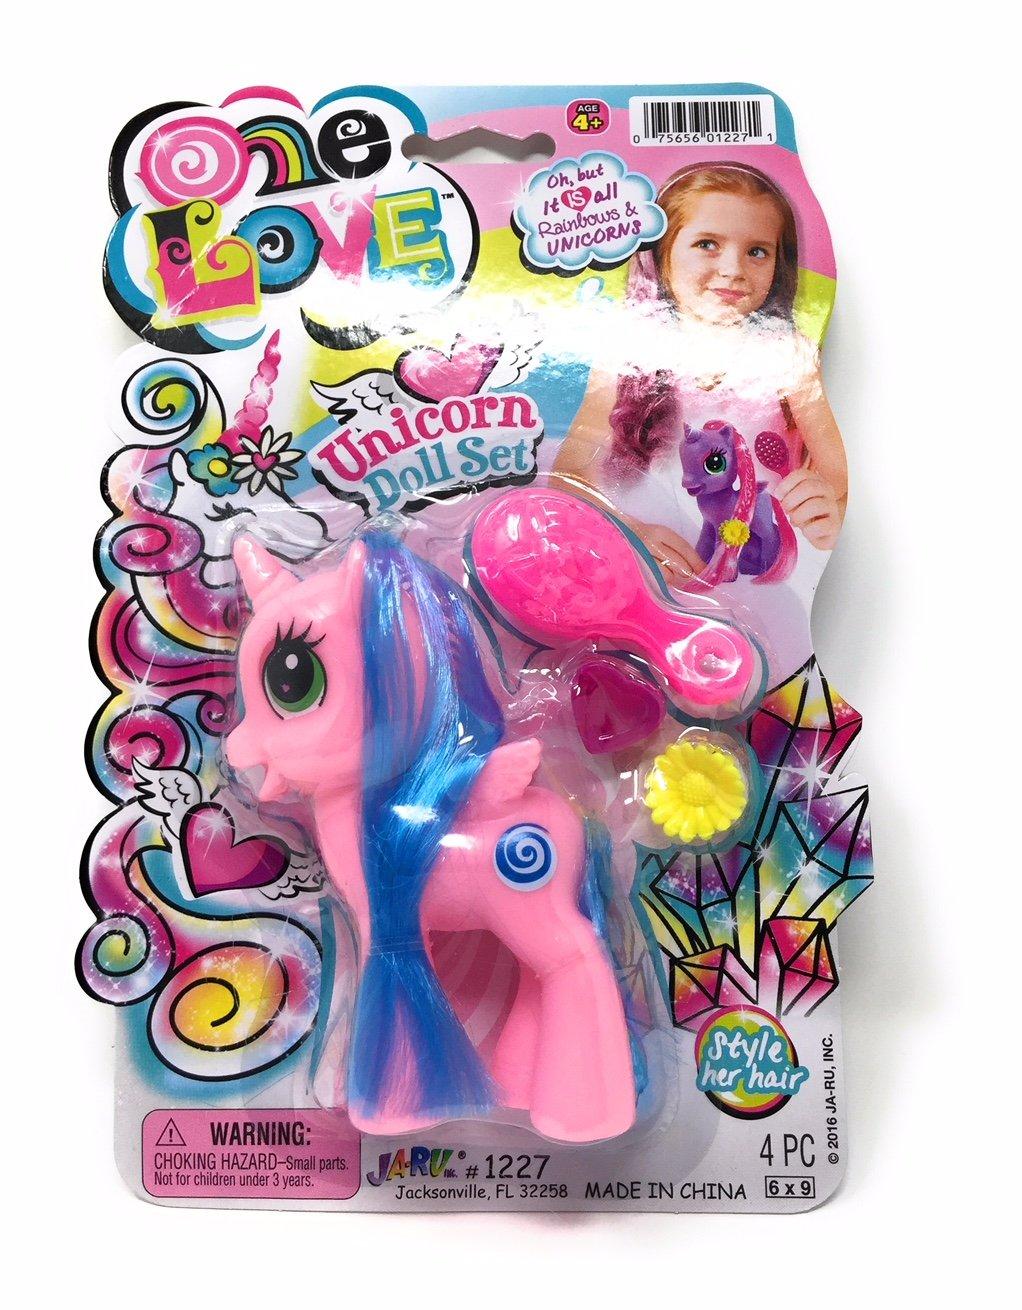 Unicorn Doll with Hair Accessories Pink JaRu